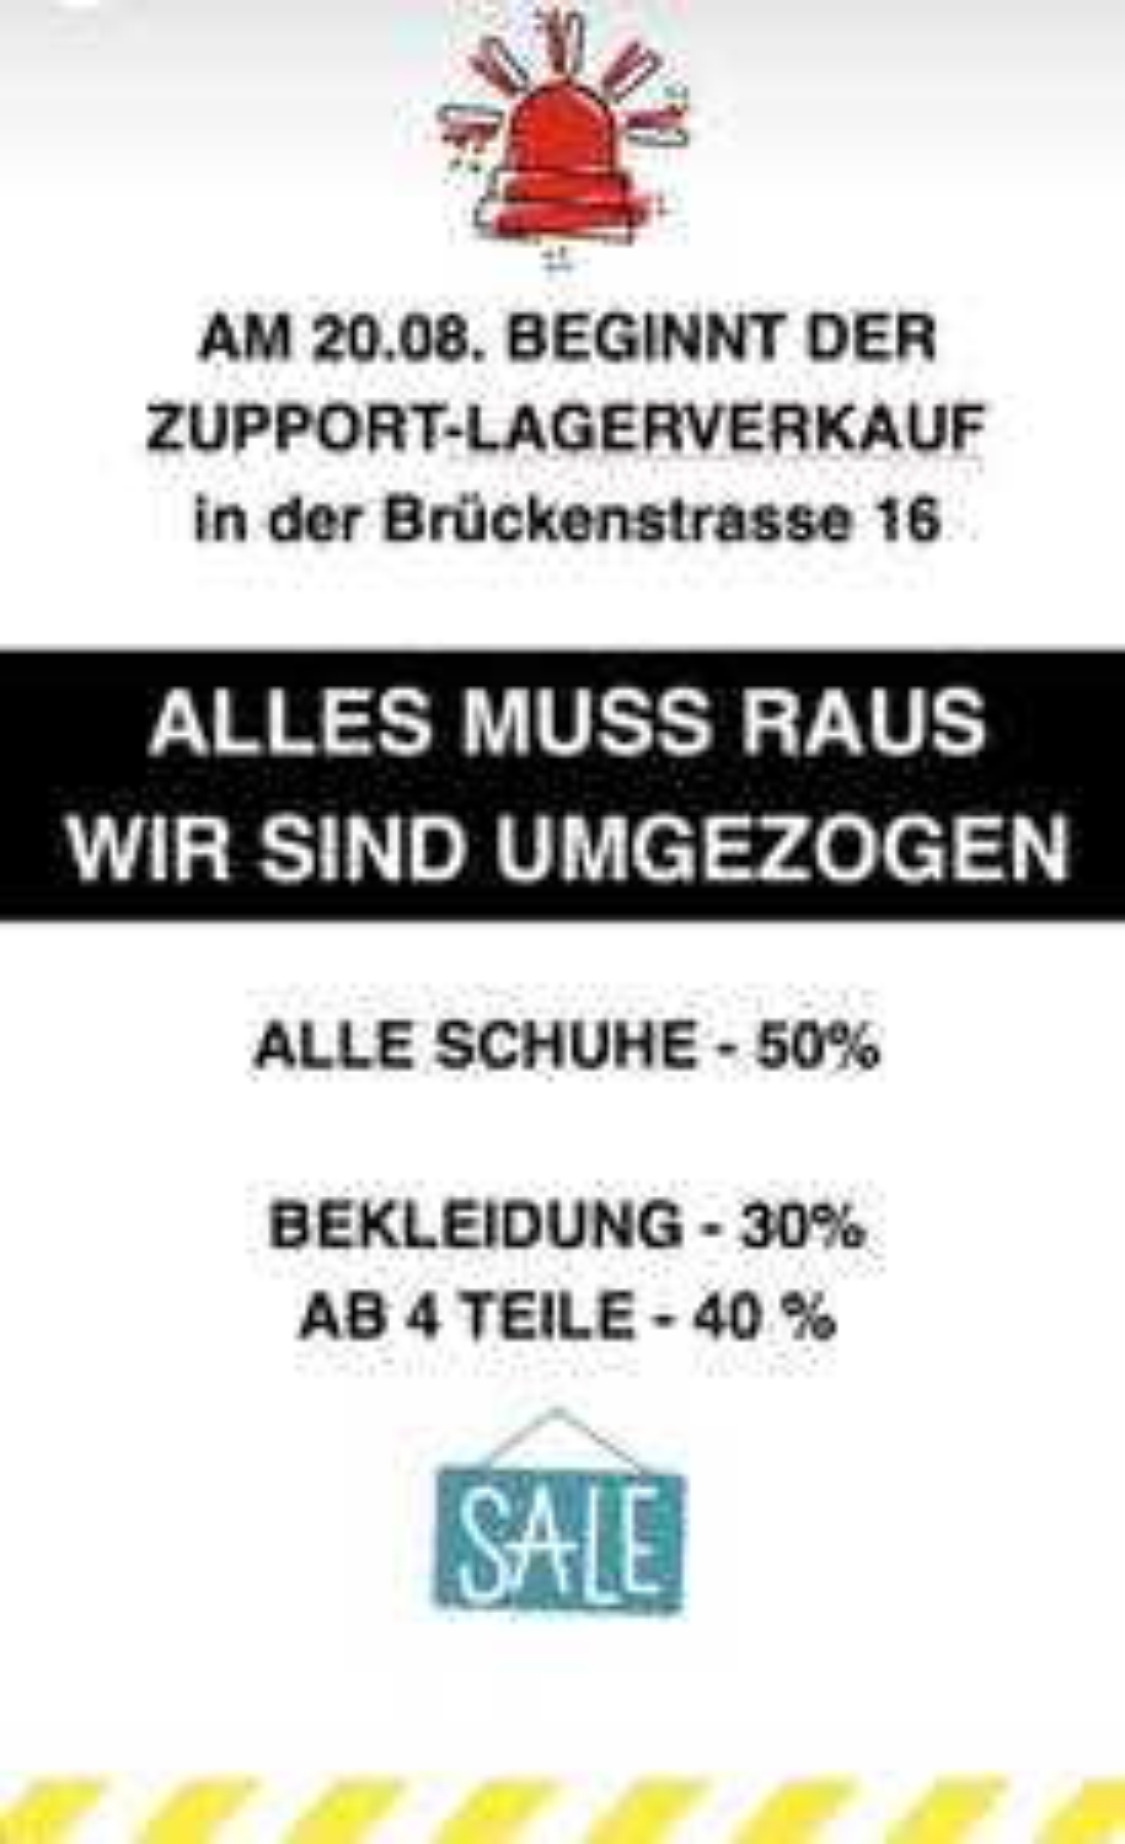 (Lokal) Lagerverkauf wegen Umzug bei ZUPPORT Store in Trier